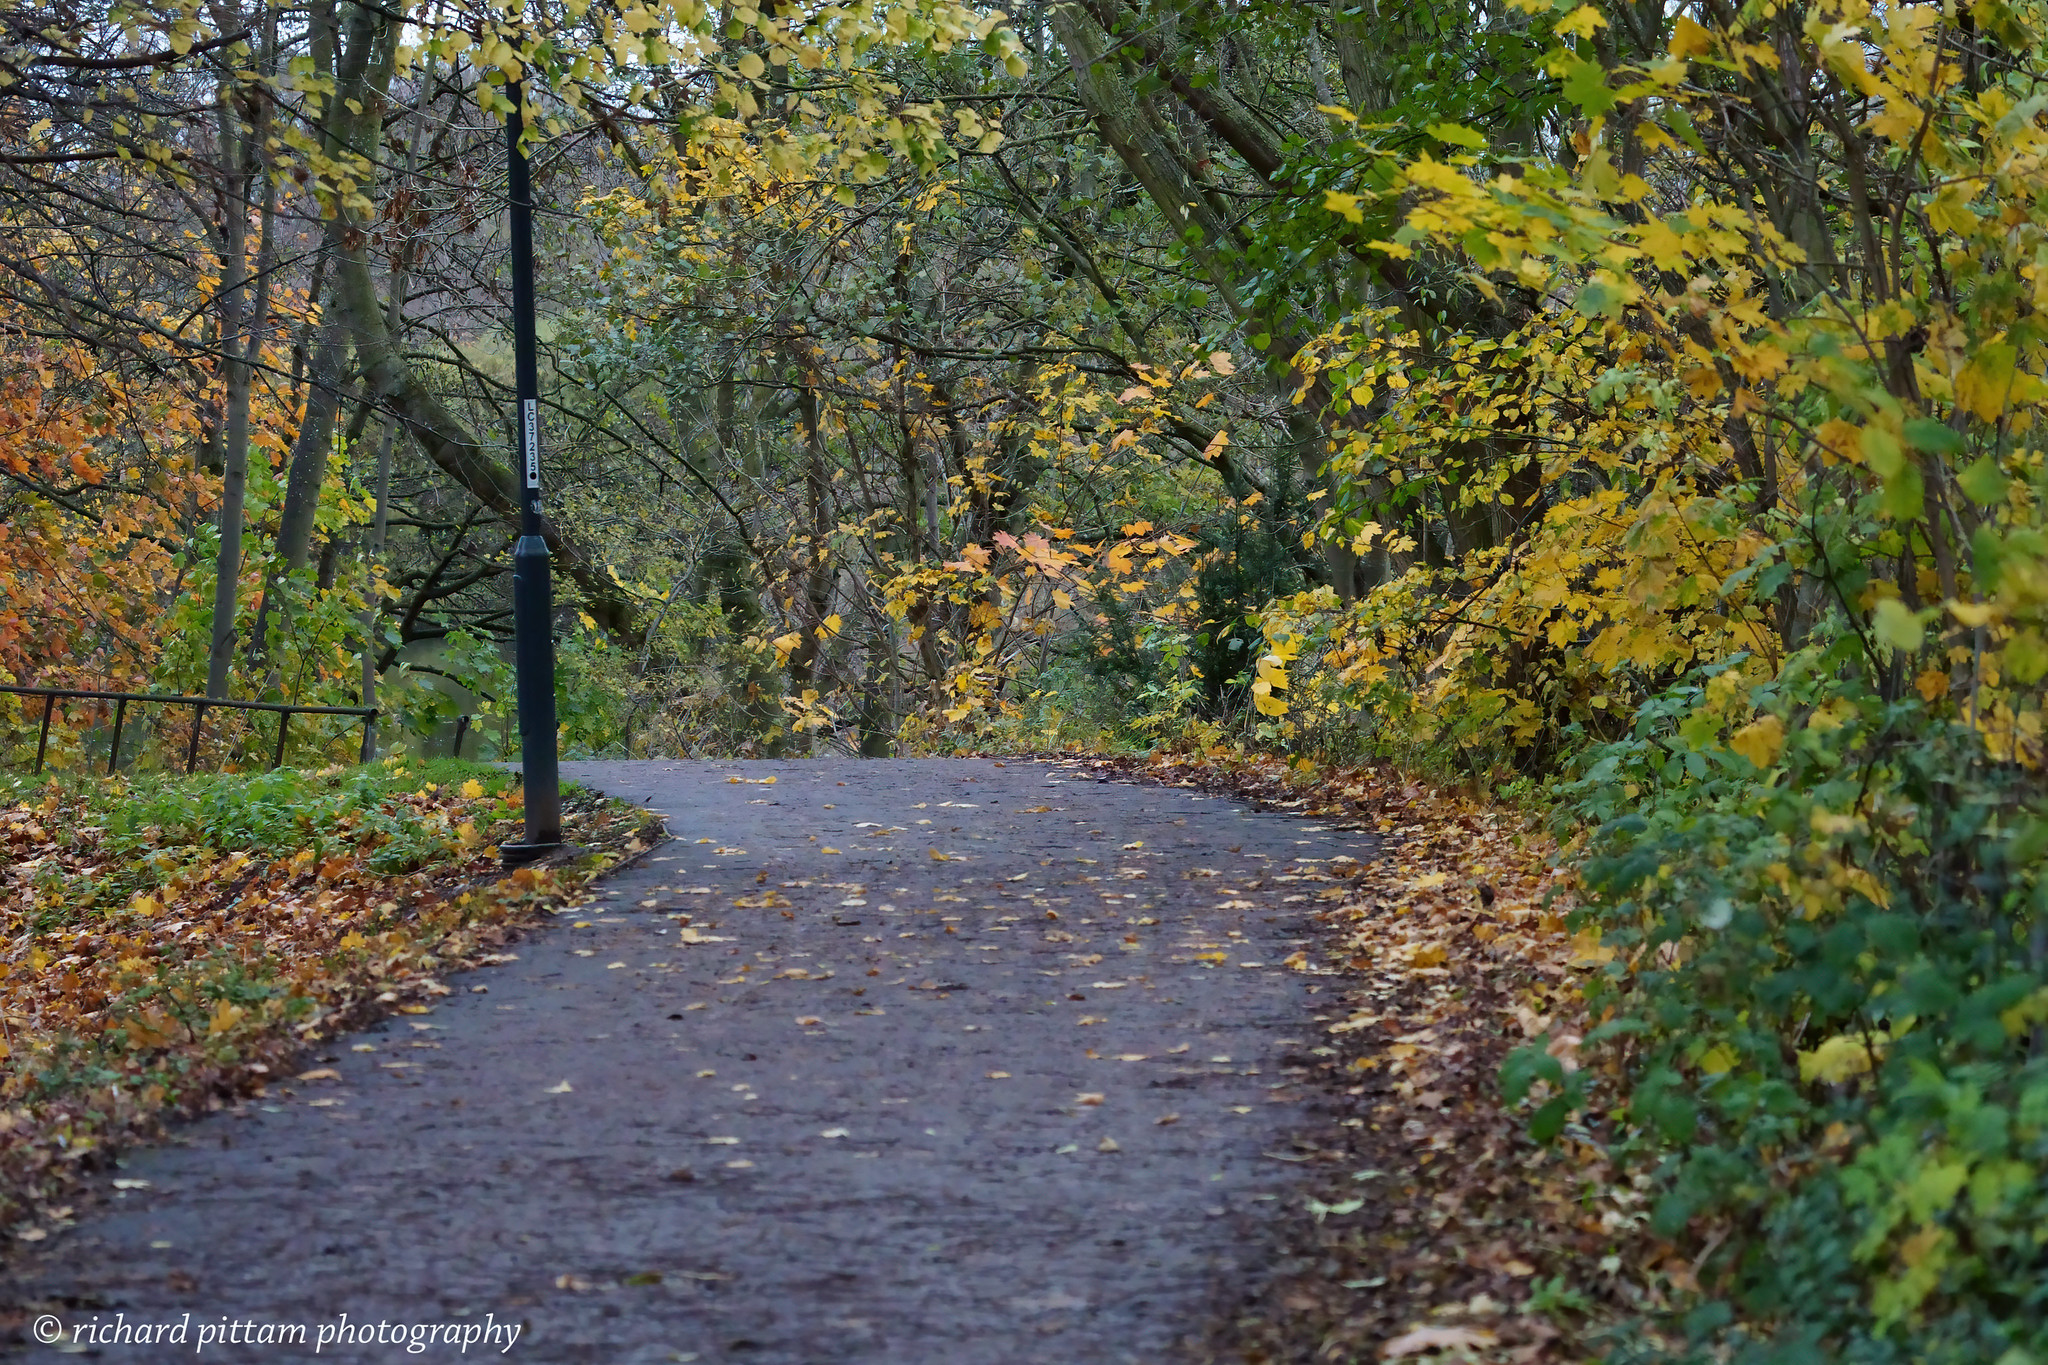 Riverbank foliage